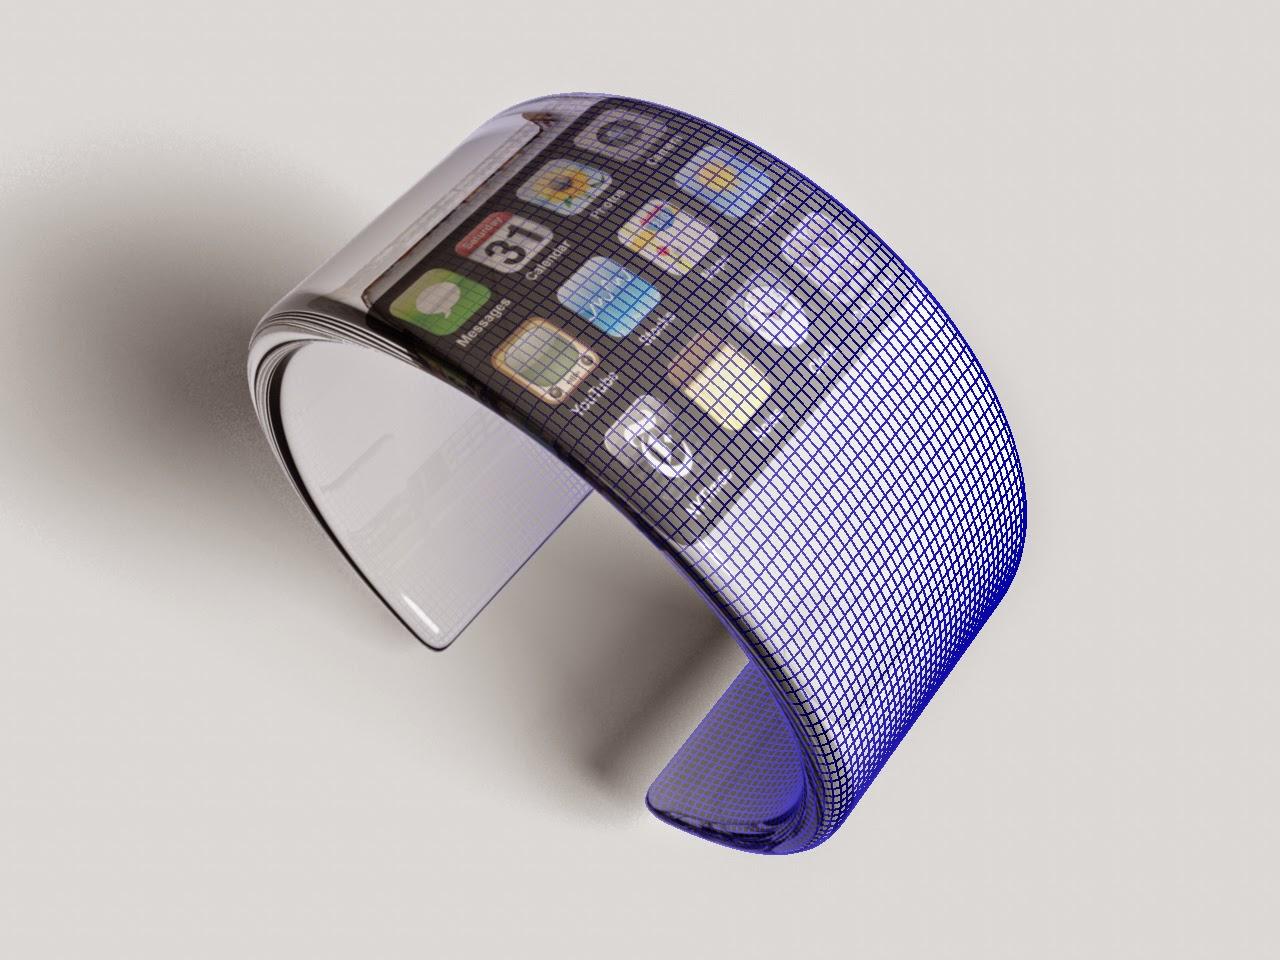 Iwatch Iphone